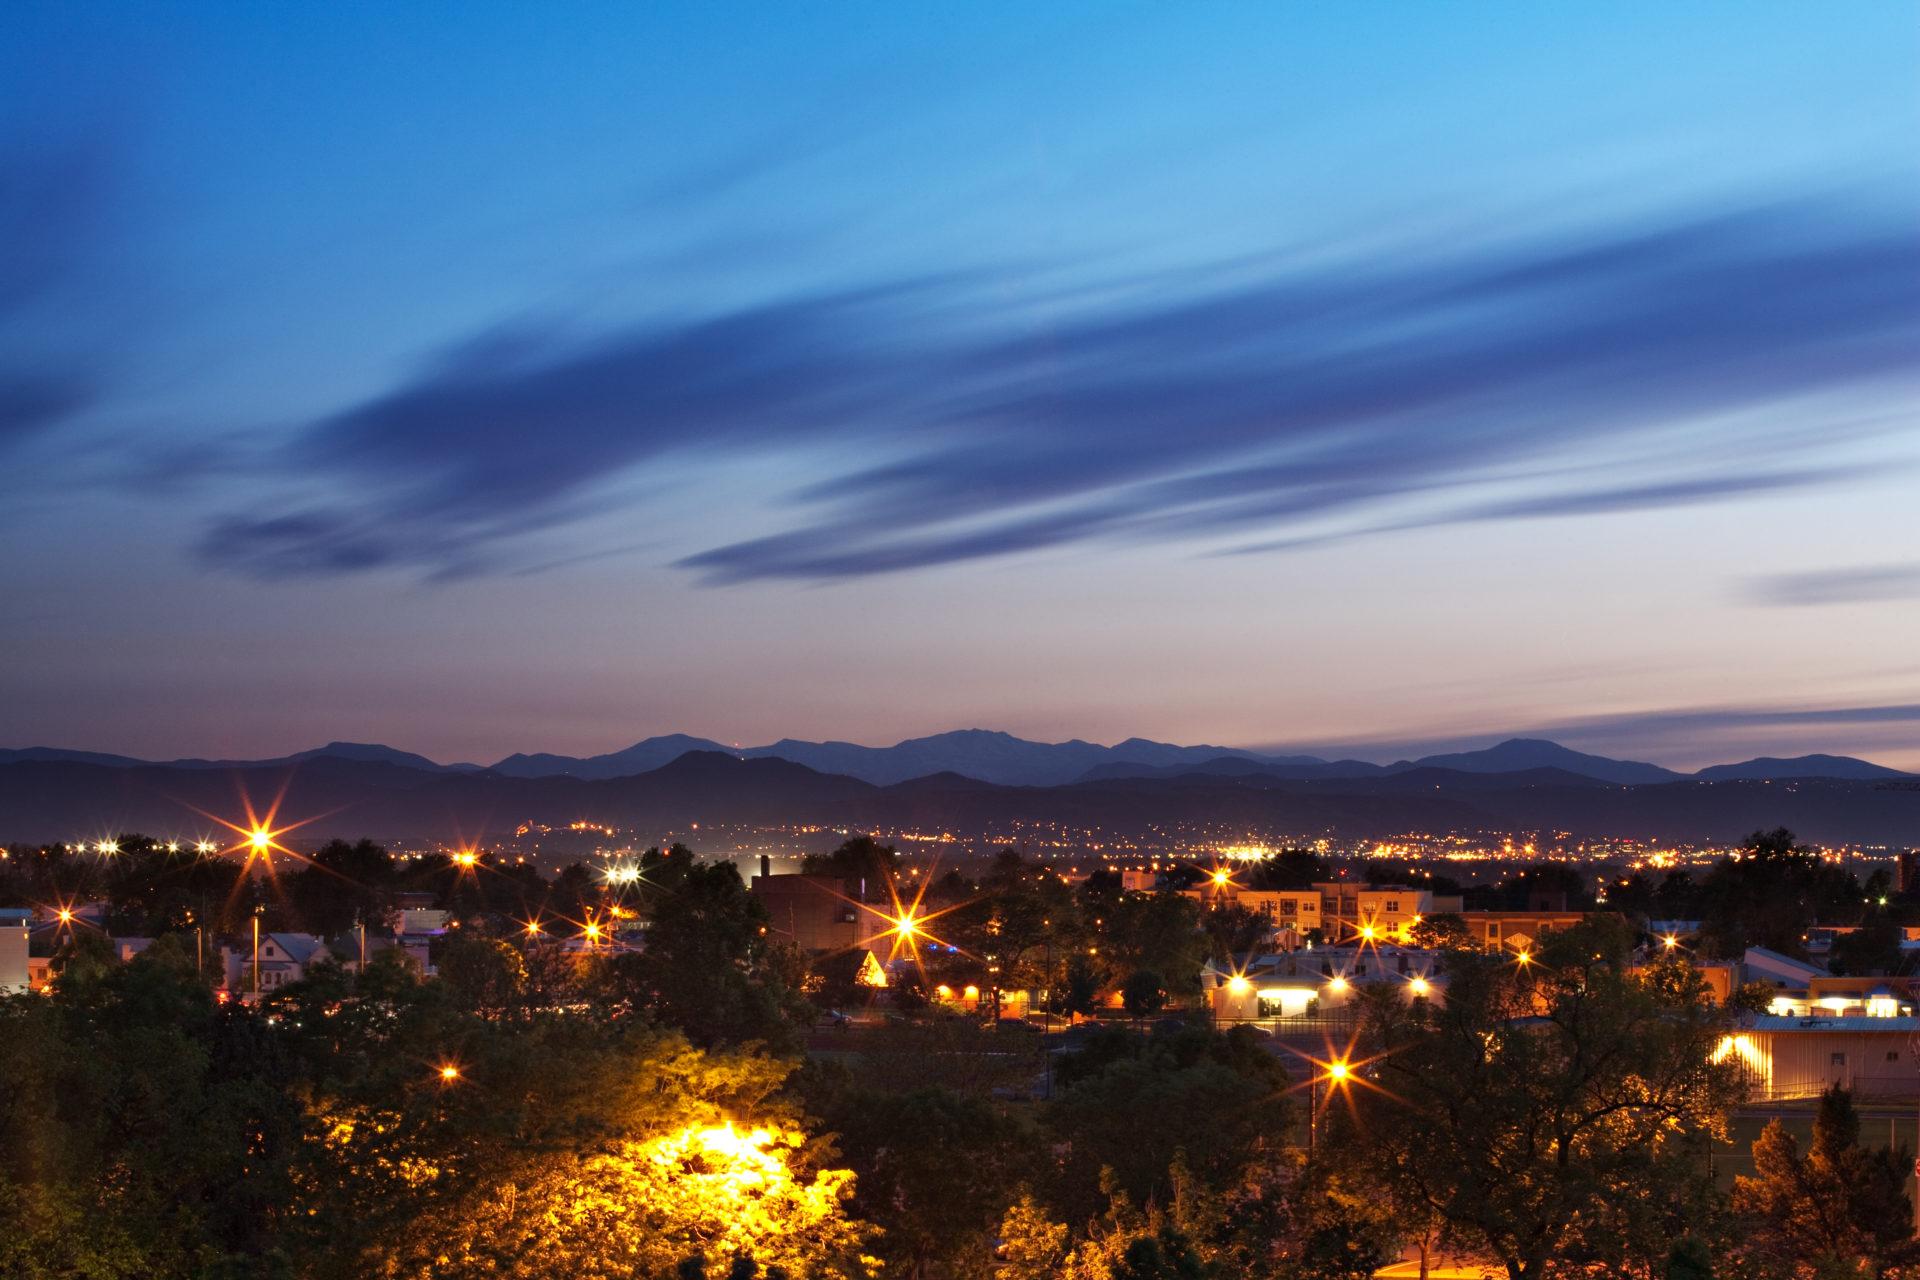 Mount Evans sunset - June 3, 2011